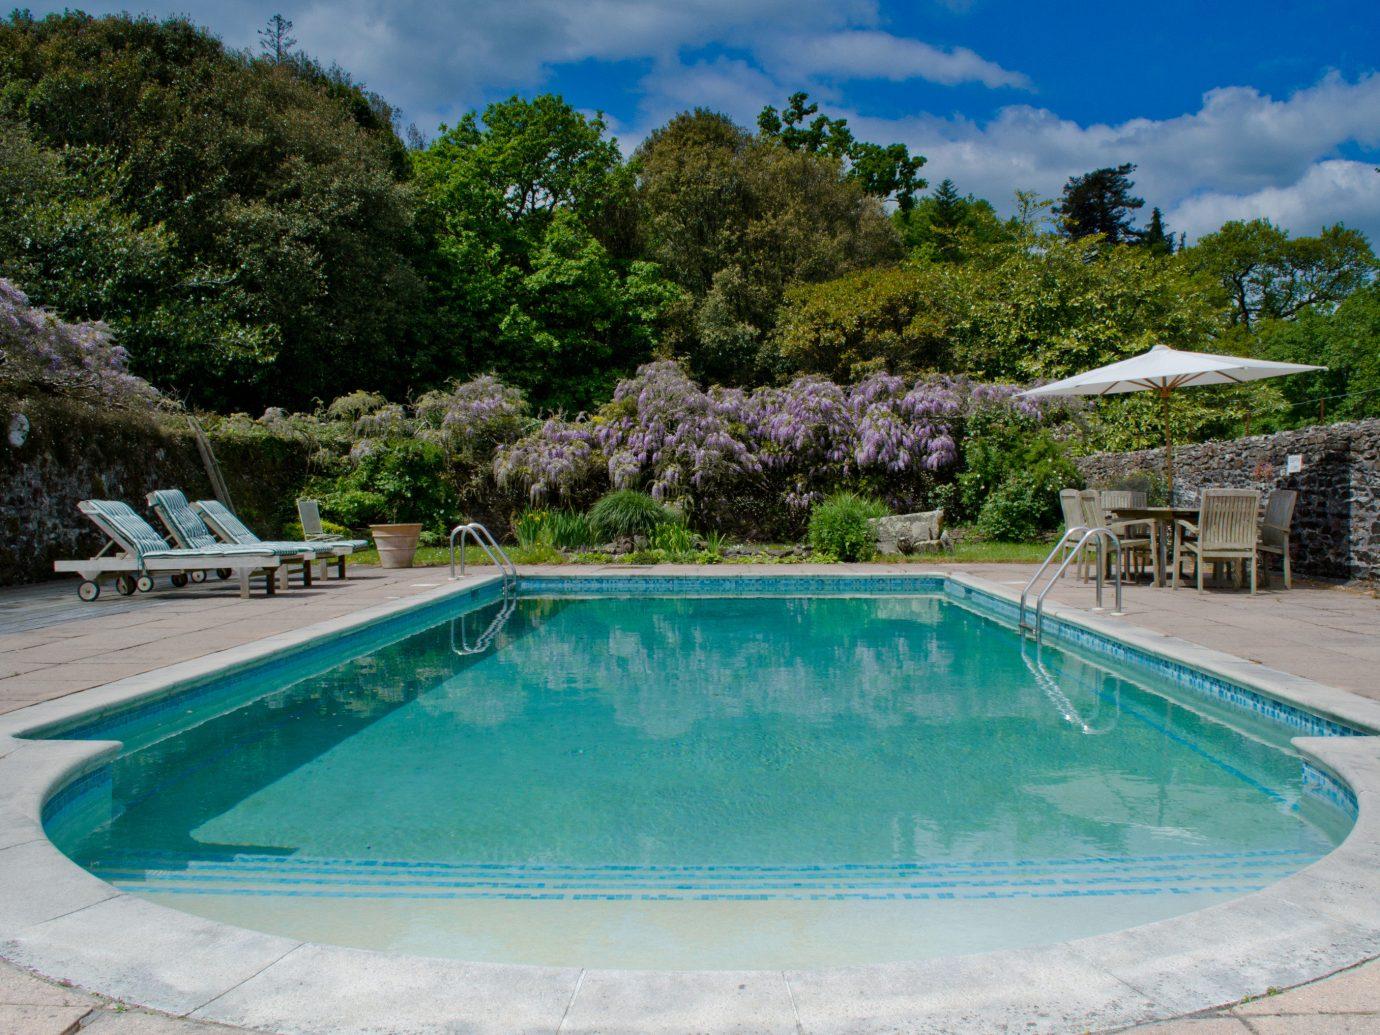 Hotels tree outdoor Pool ground swimming pool property estate backyard reflecting pool Villa swimming real estate Resort blue bathtub